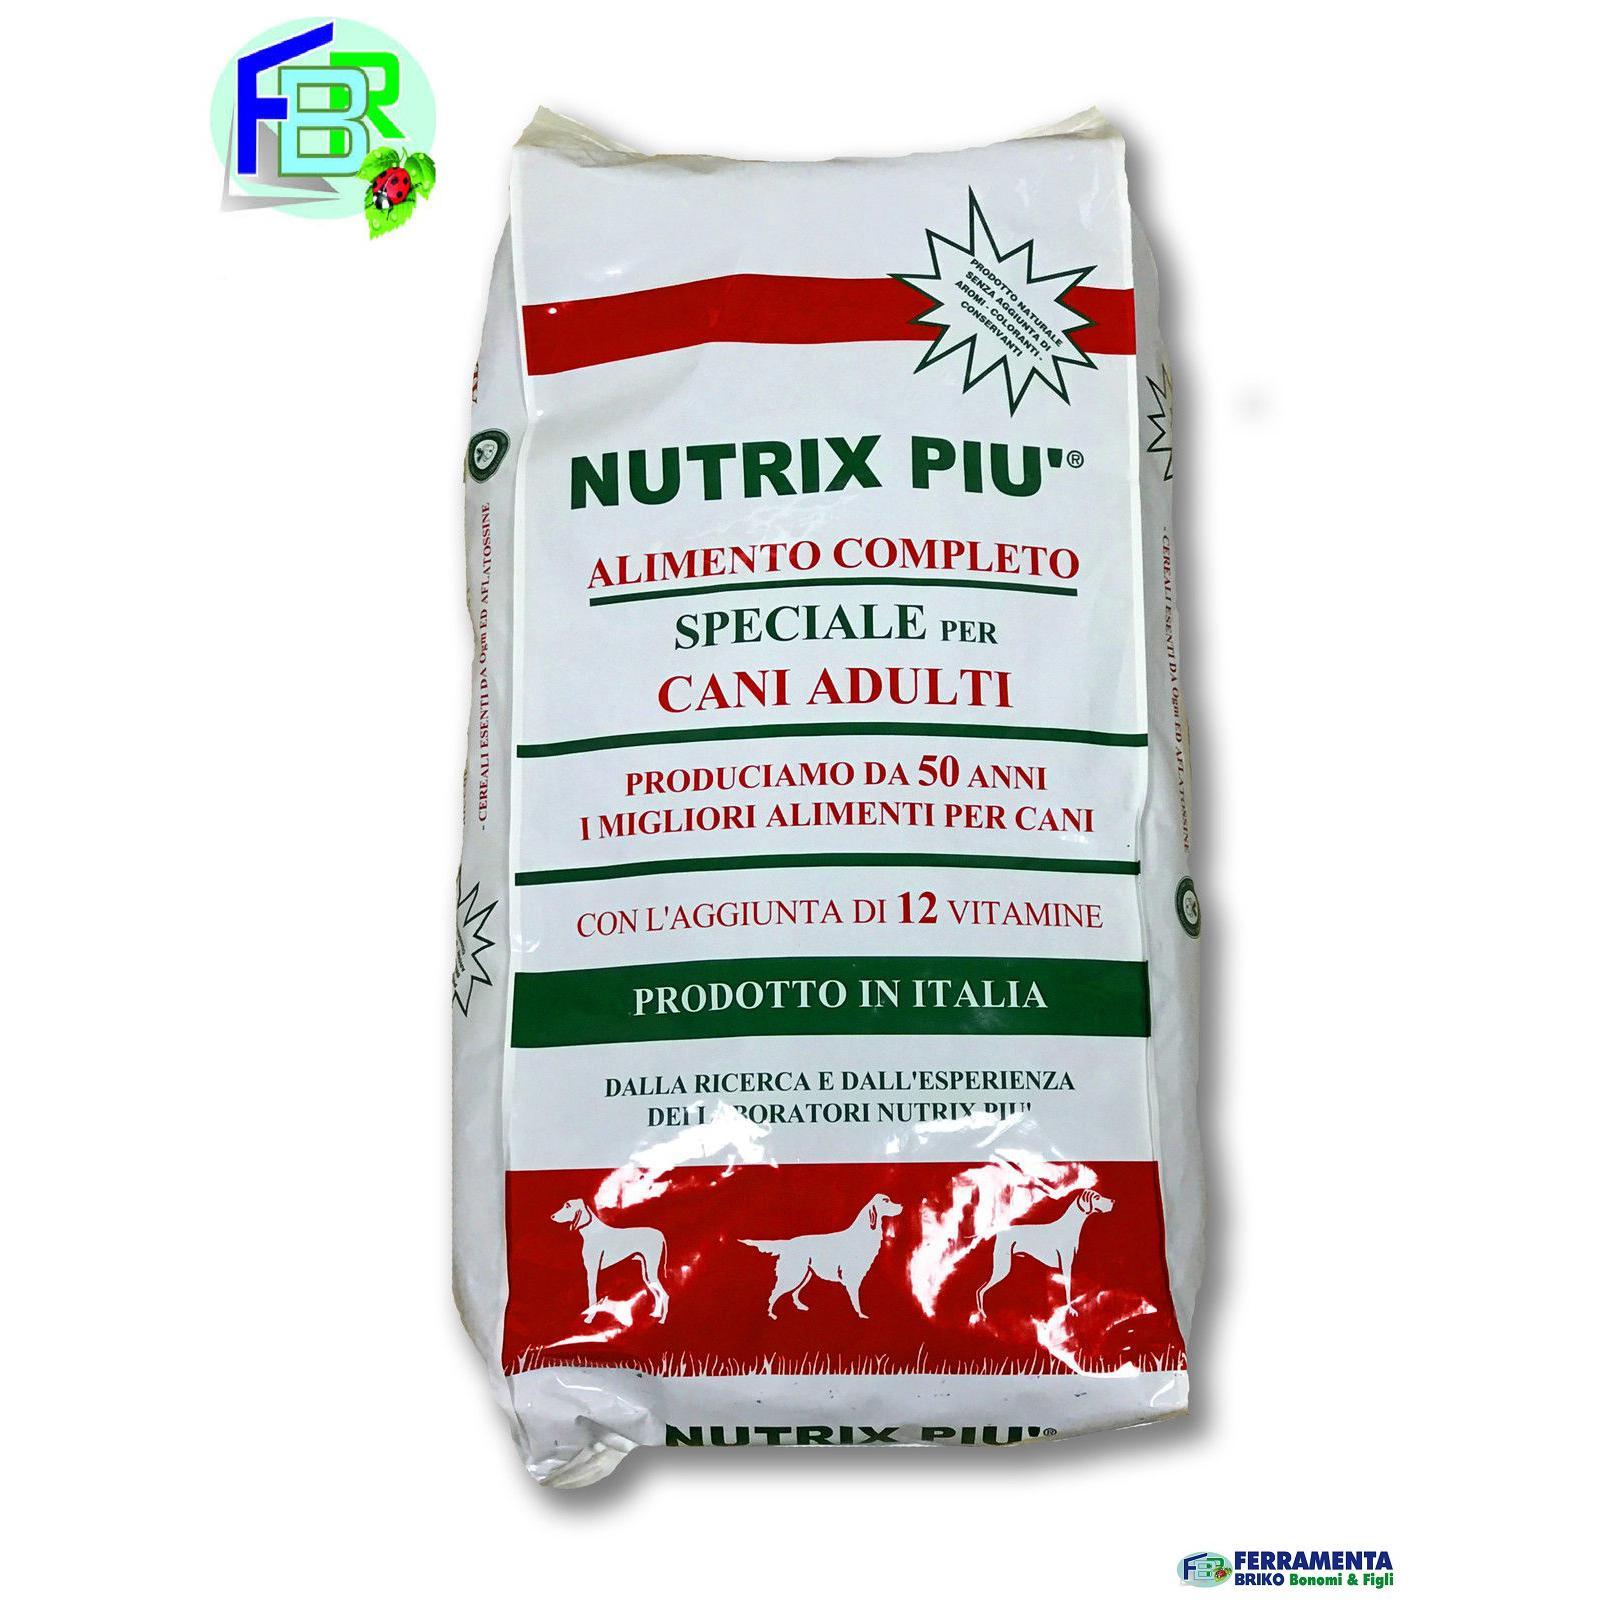 CROCCHETTE MANGIME NUTRIX PIU 20KG MANTENIMENTO CANE ADULTO 12 VITAMINE